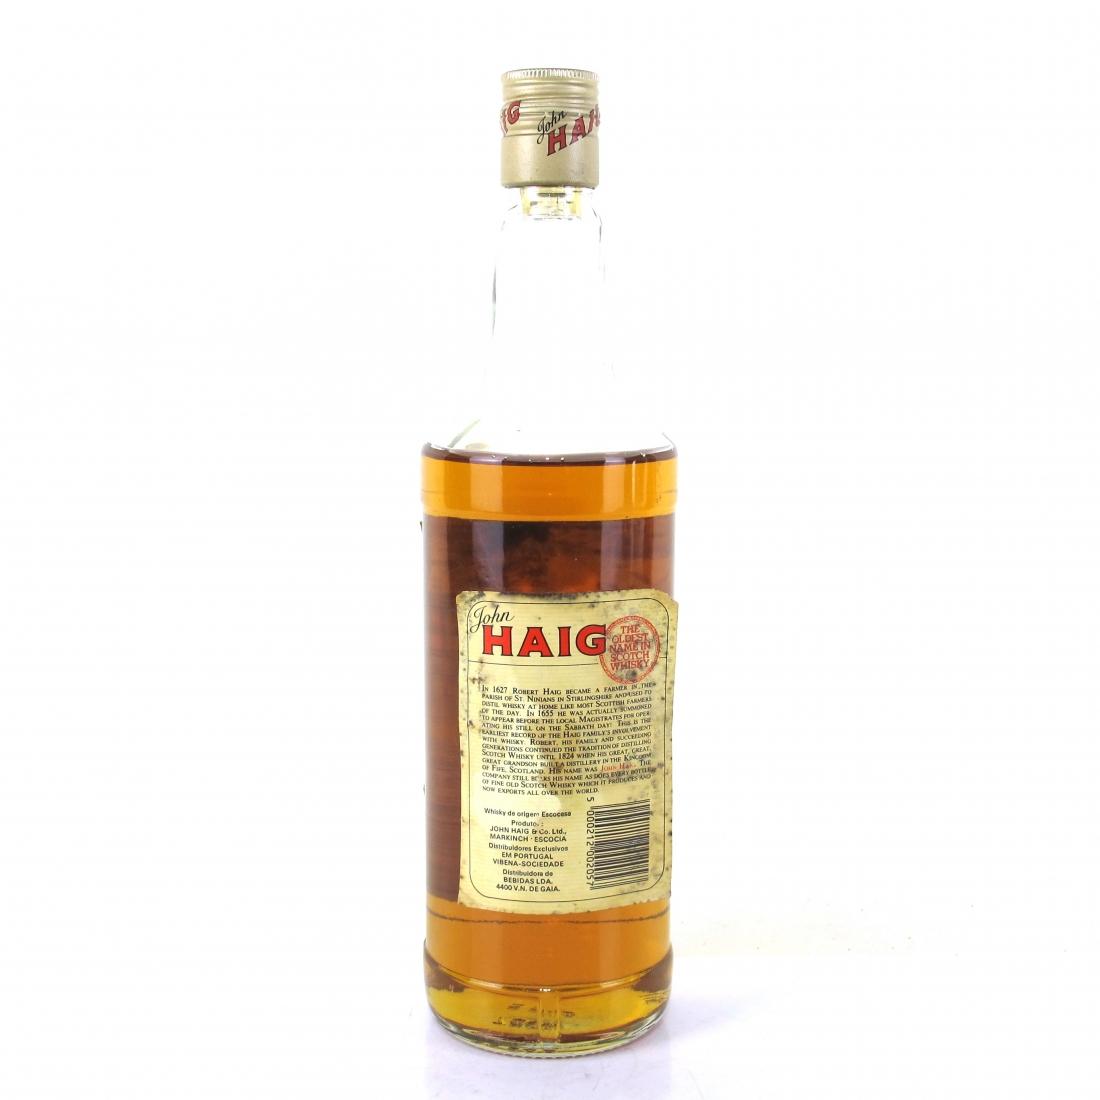 Haig Fine Old Scotch Whisky 1980s